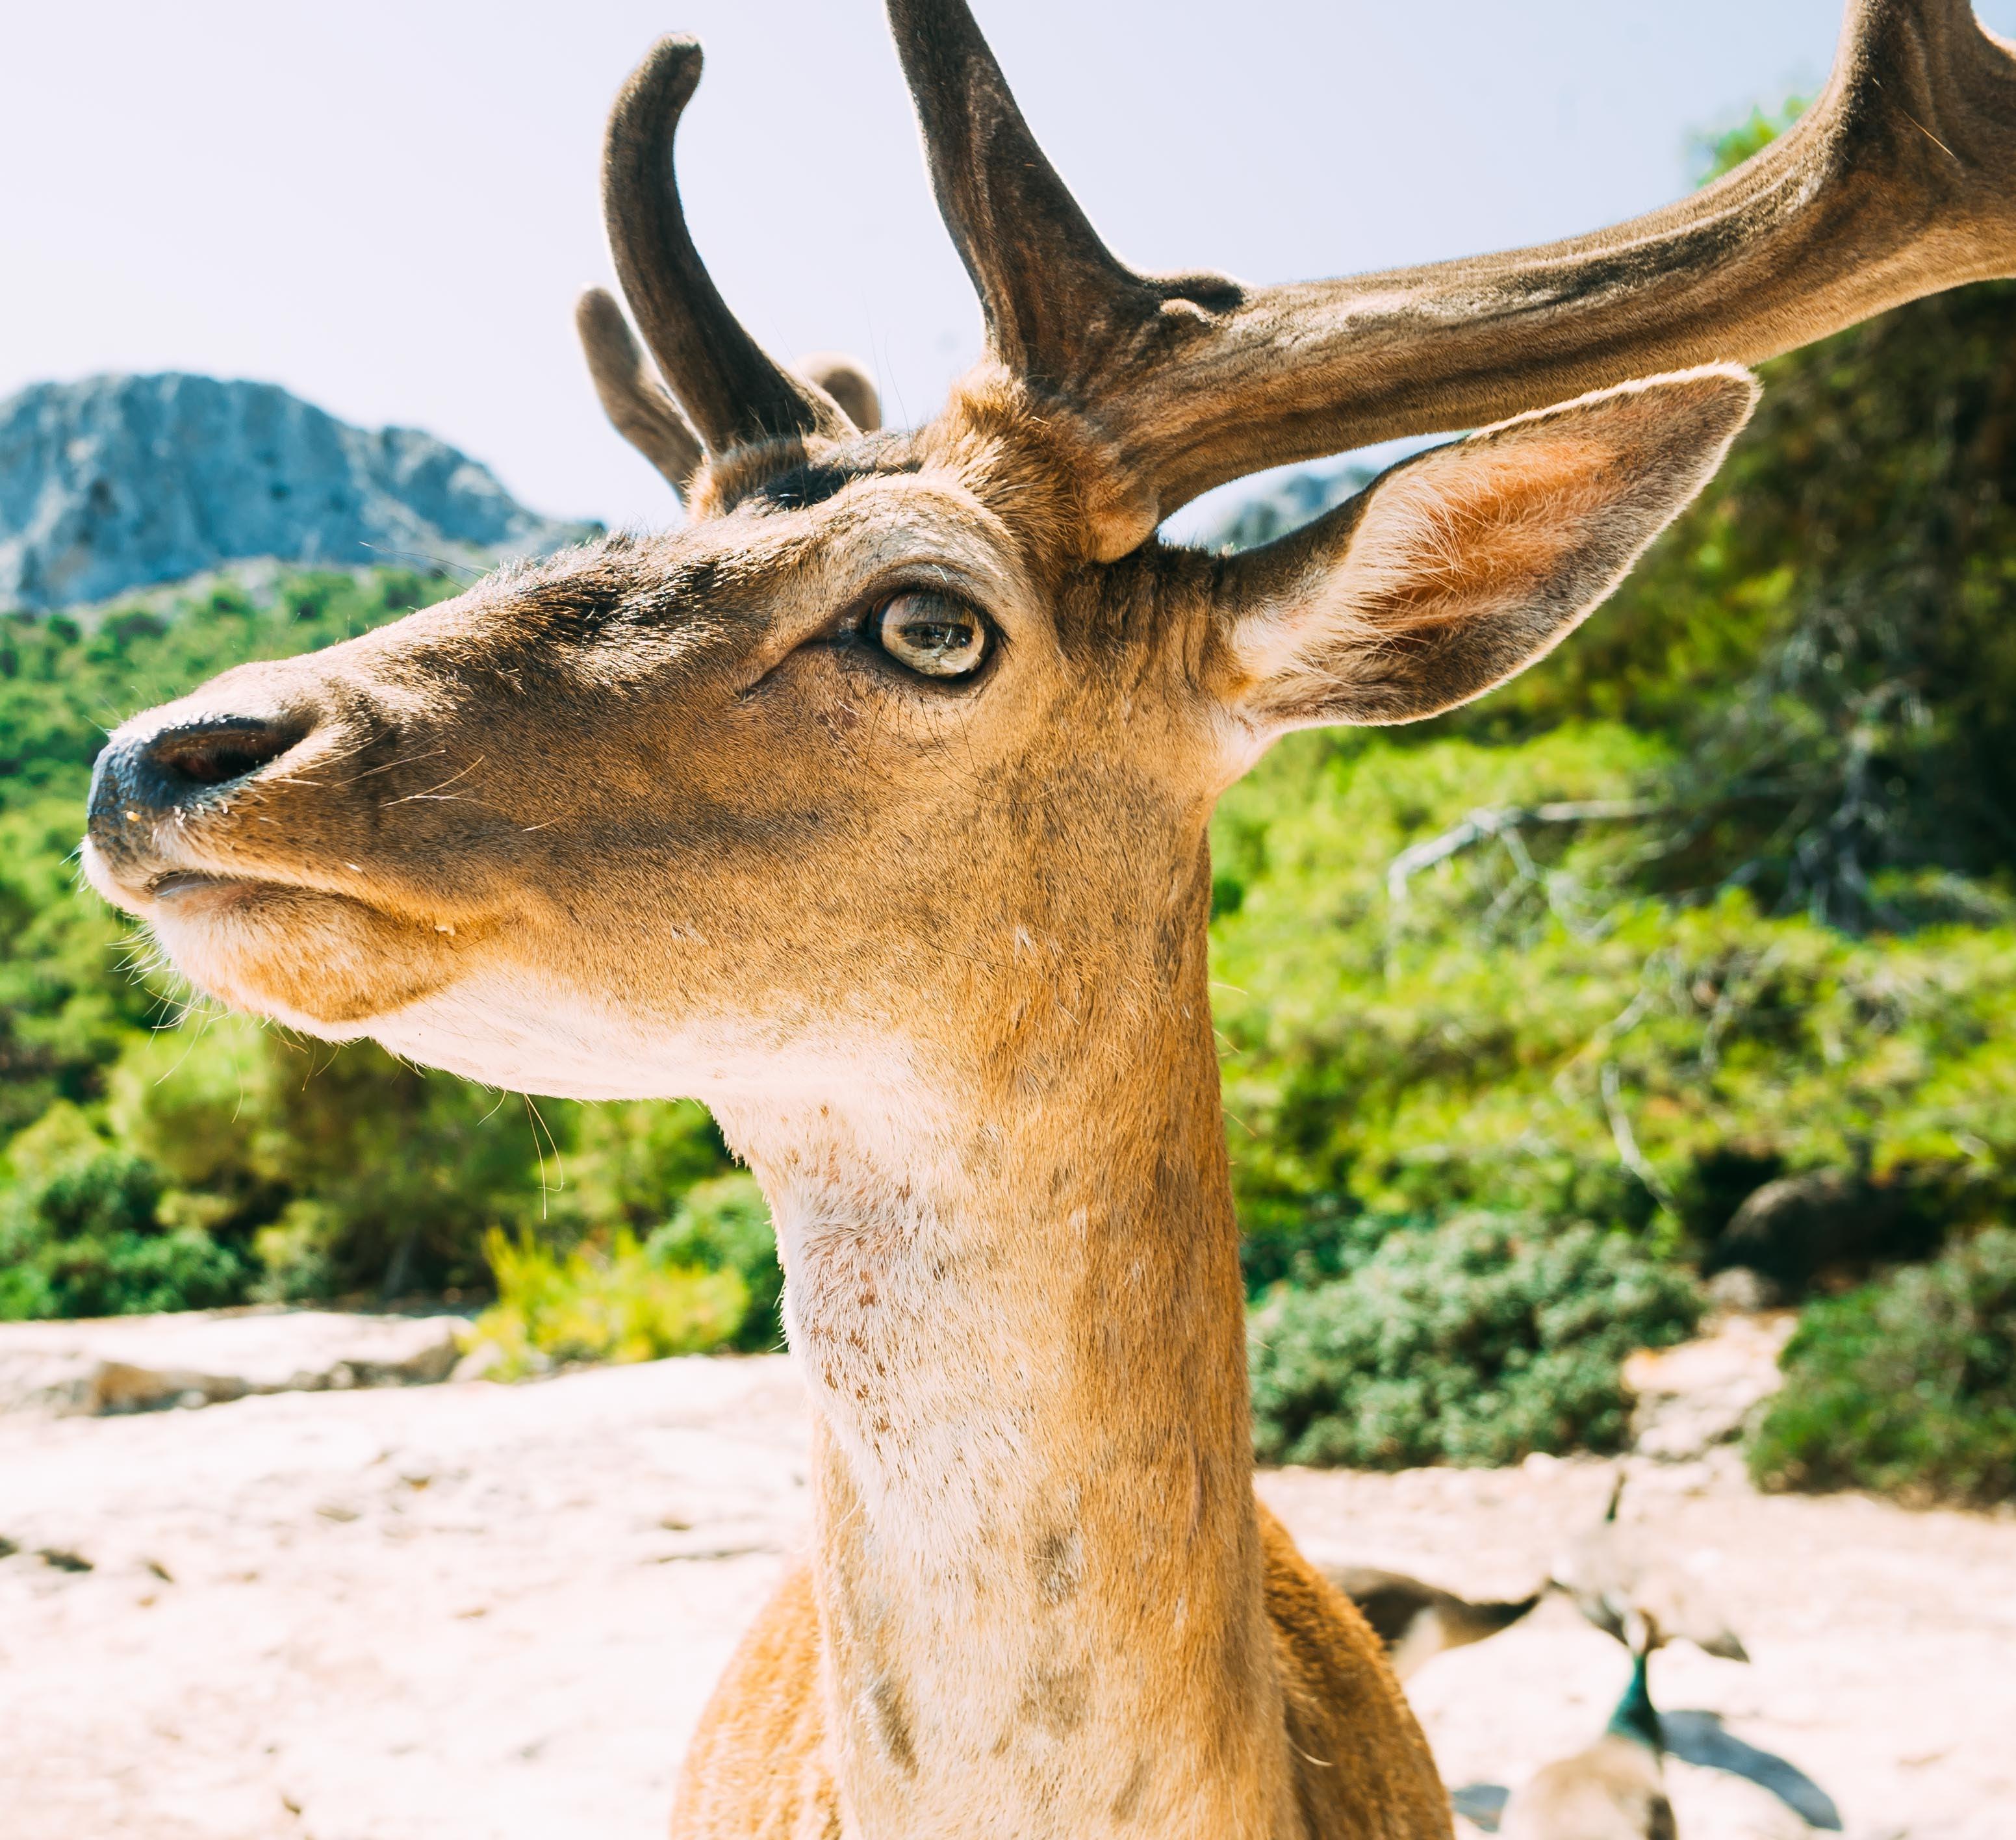 brown deer near trees closeup photography